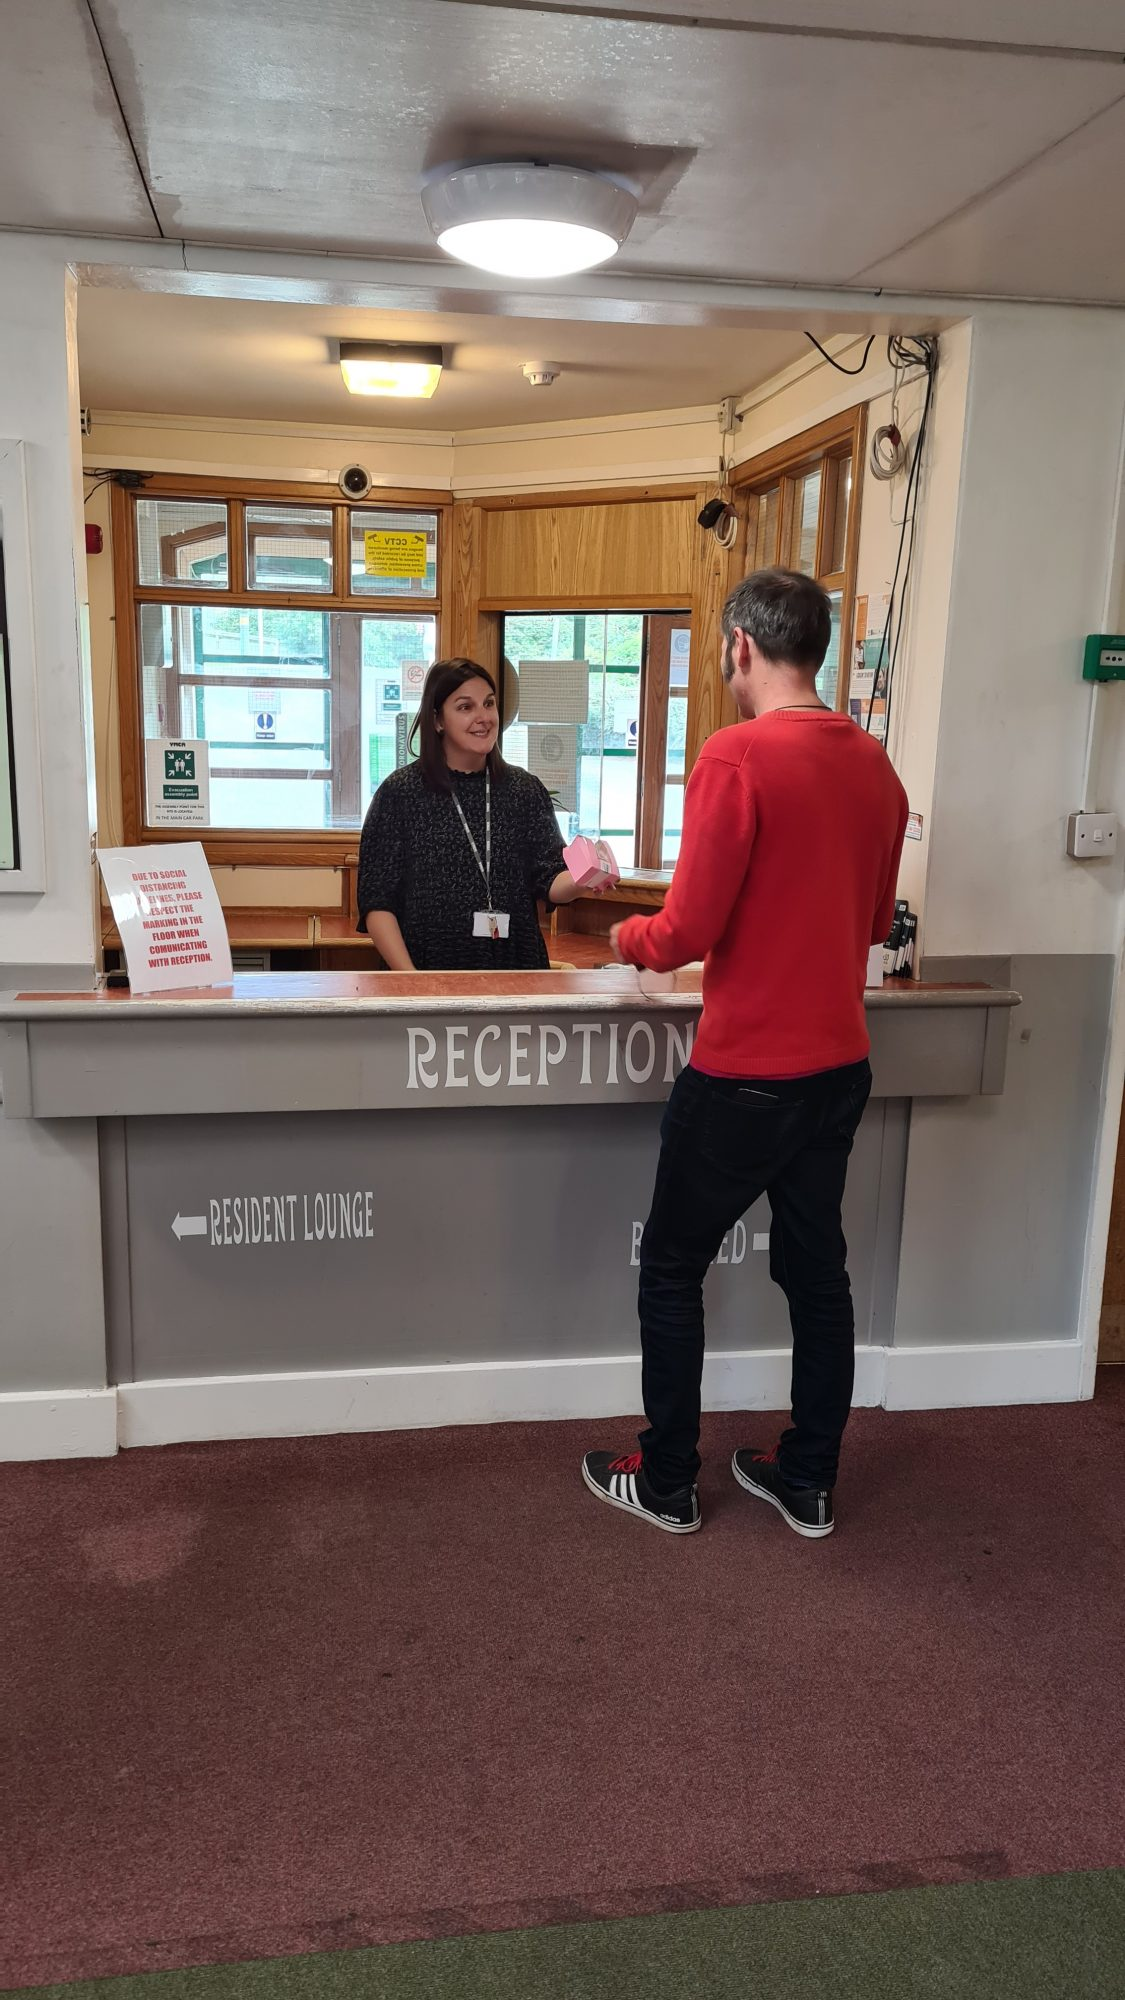 man and woman talking at reception desk